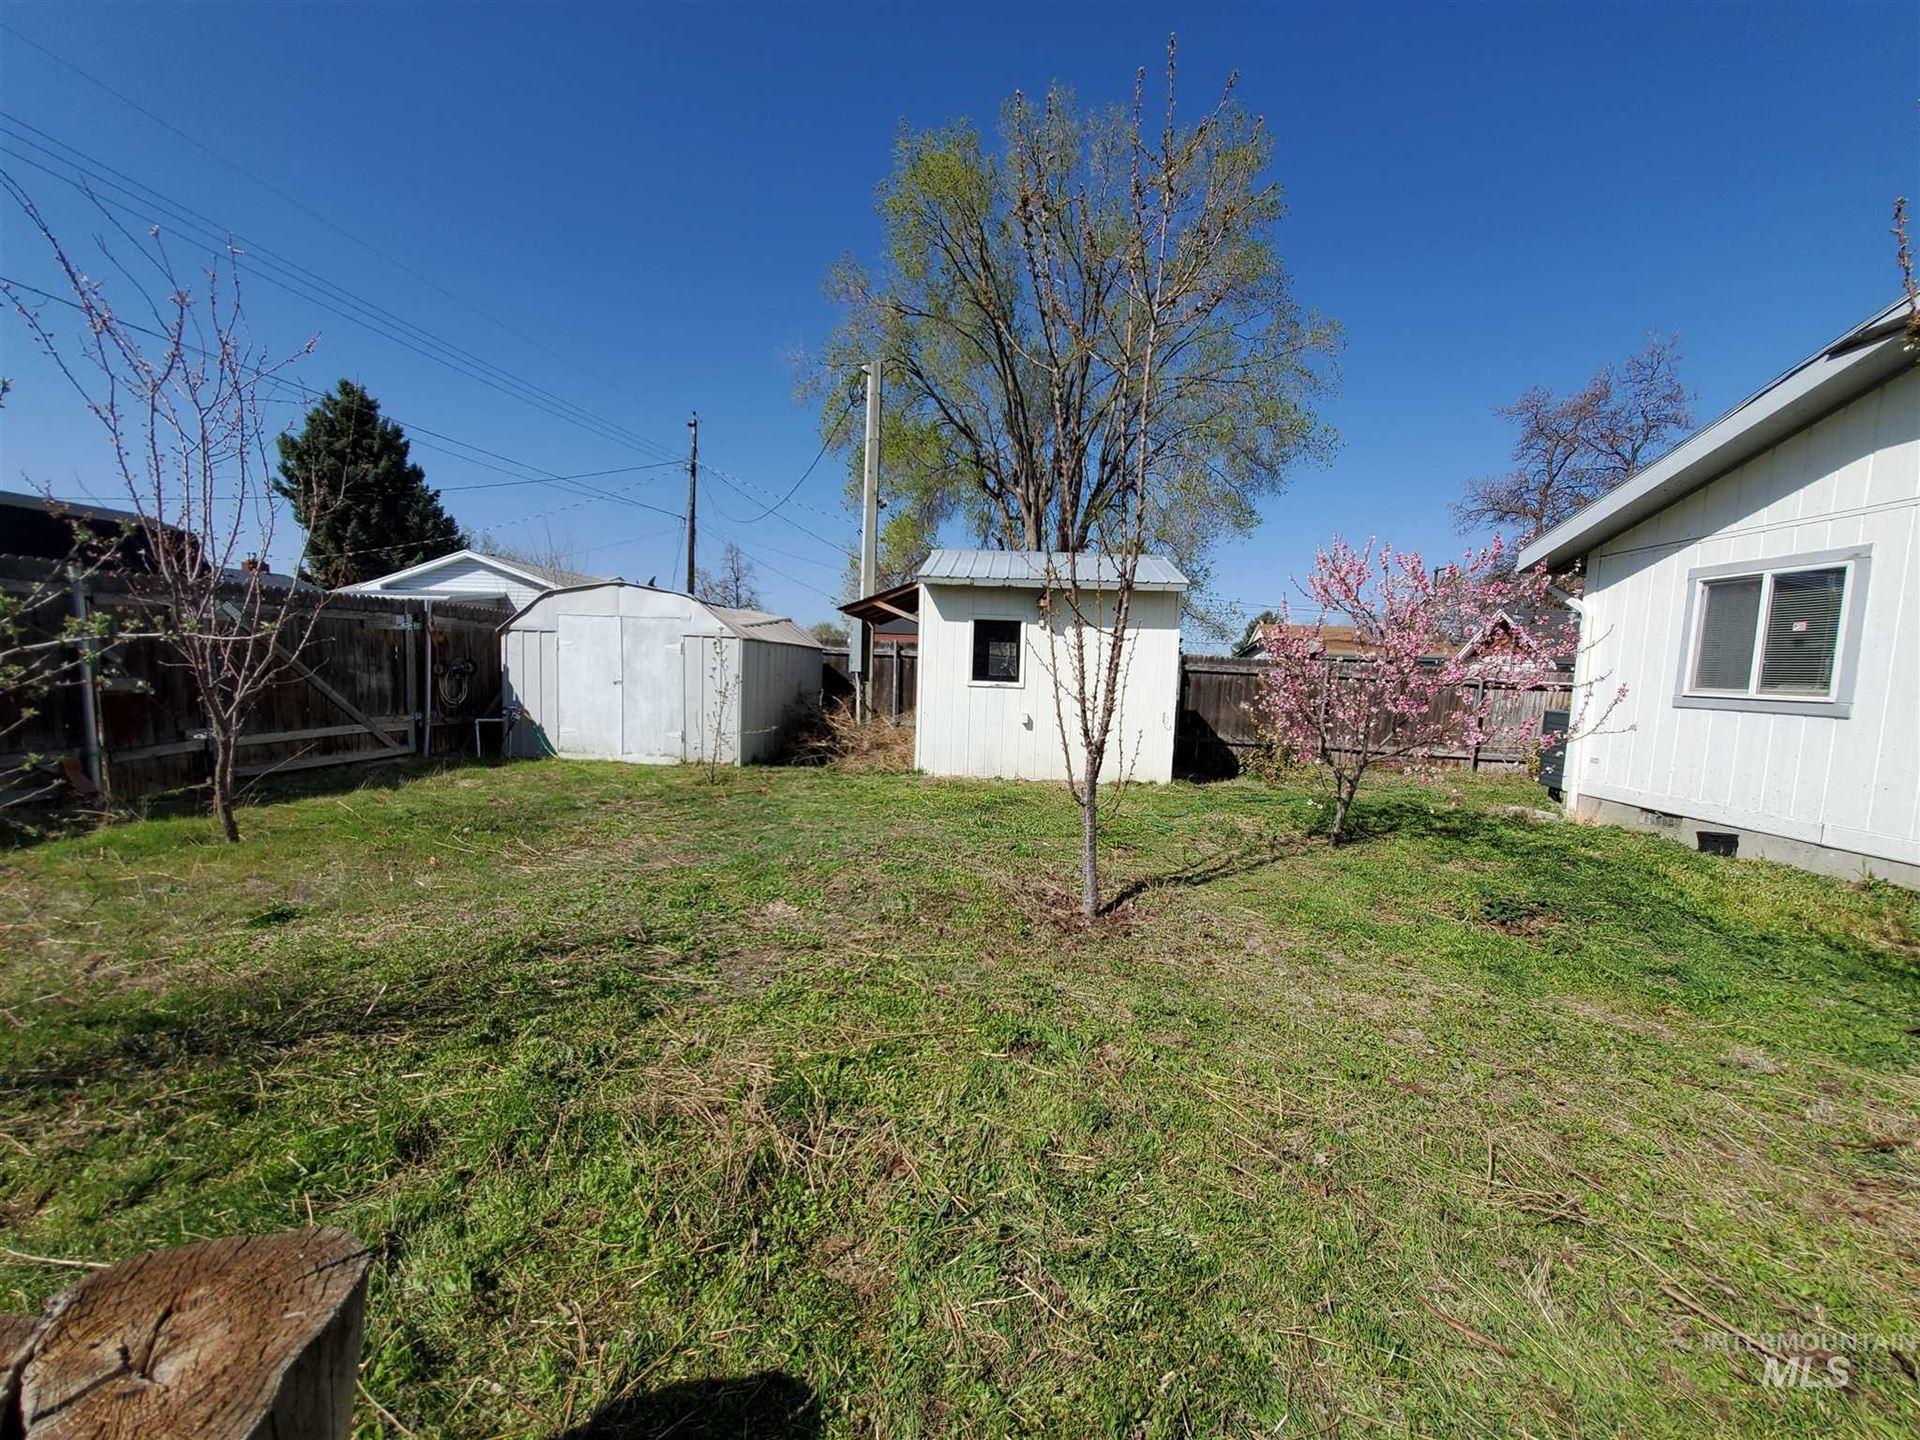 Photo of 241 Blaine Ave, Nampa, ID 83651 (MLS # 98798605)